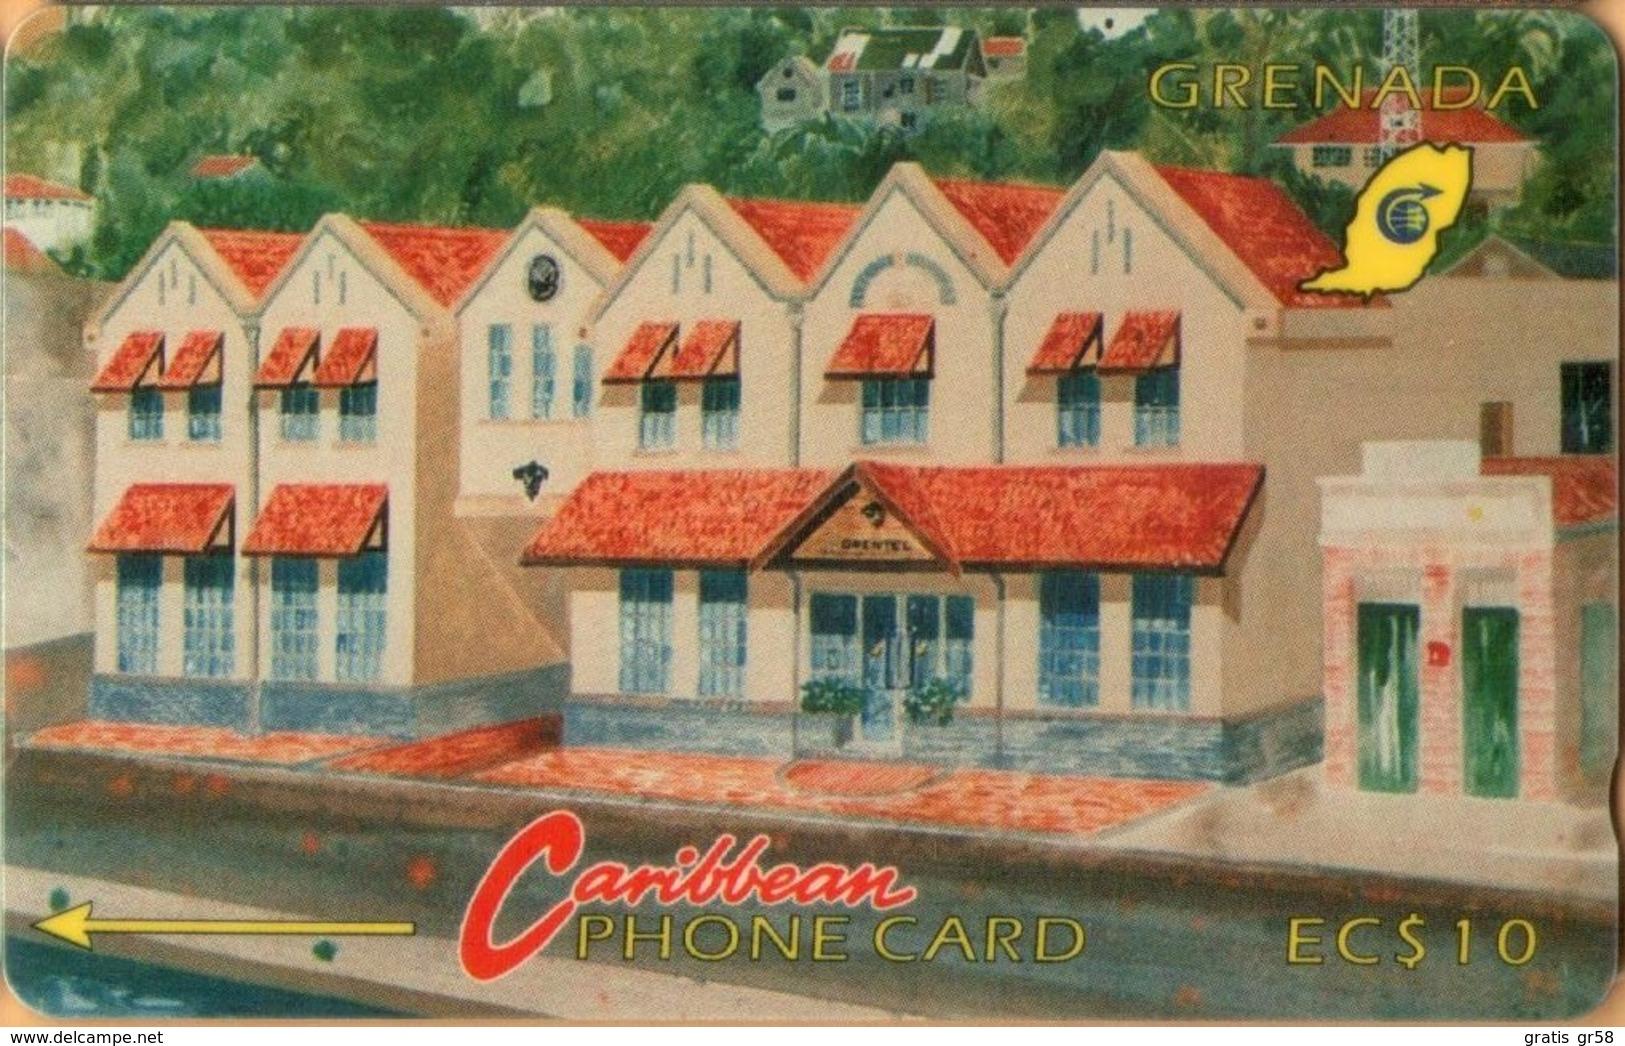 Grenada - GPT, GRE-4B, Grentel Building (Without Logo), 4CGRB, 10 EC$, Buildings, 5,250ex, 1992, Used As Scan - Grenada